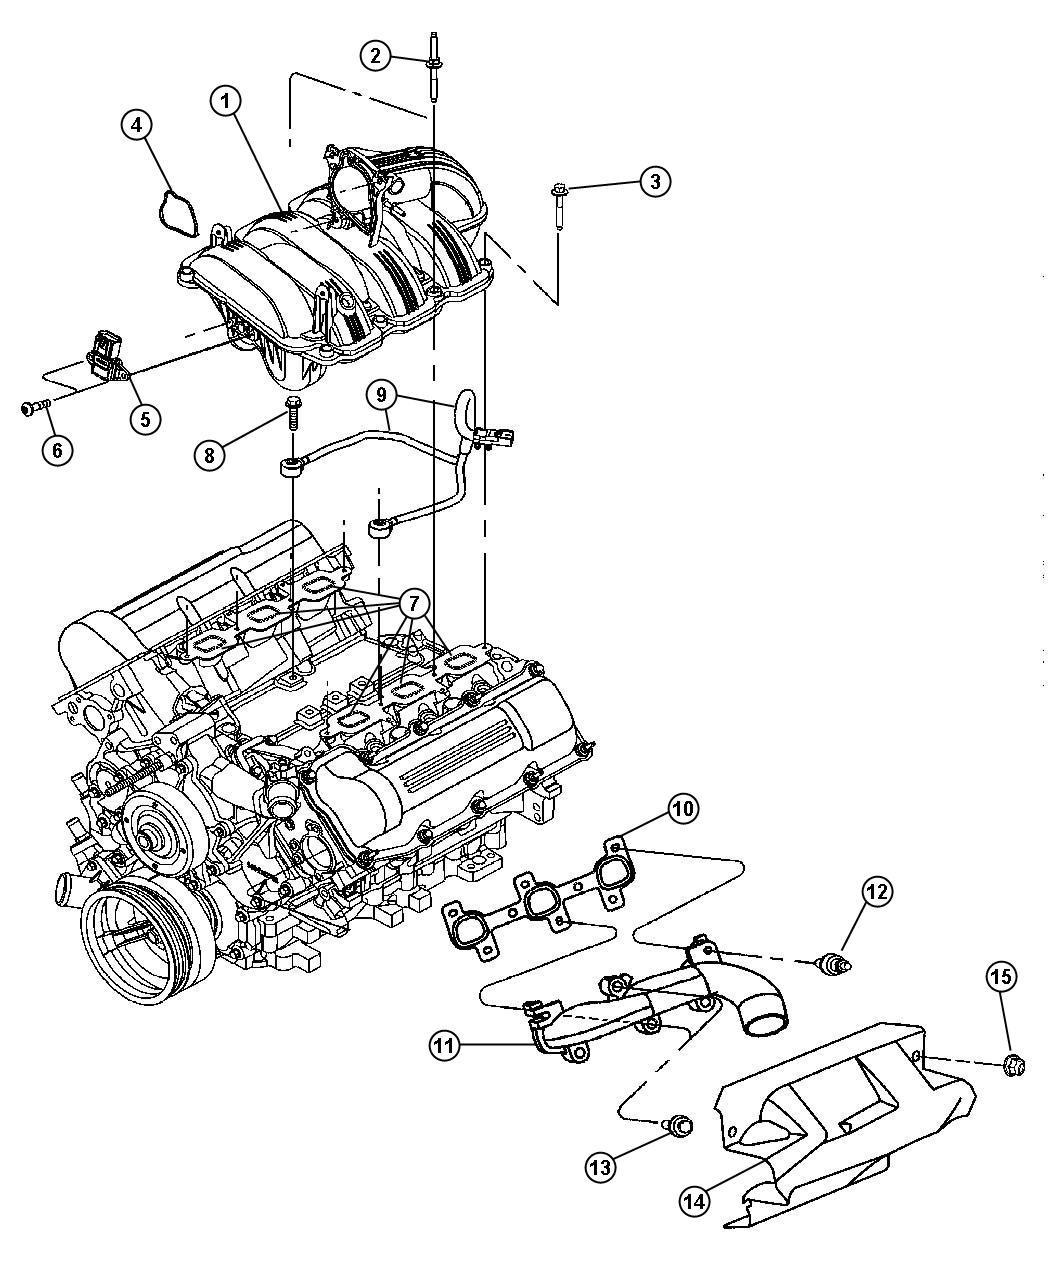 2013 Chrysler 200 Gasket. Throttle body to intake. Evaevd